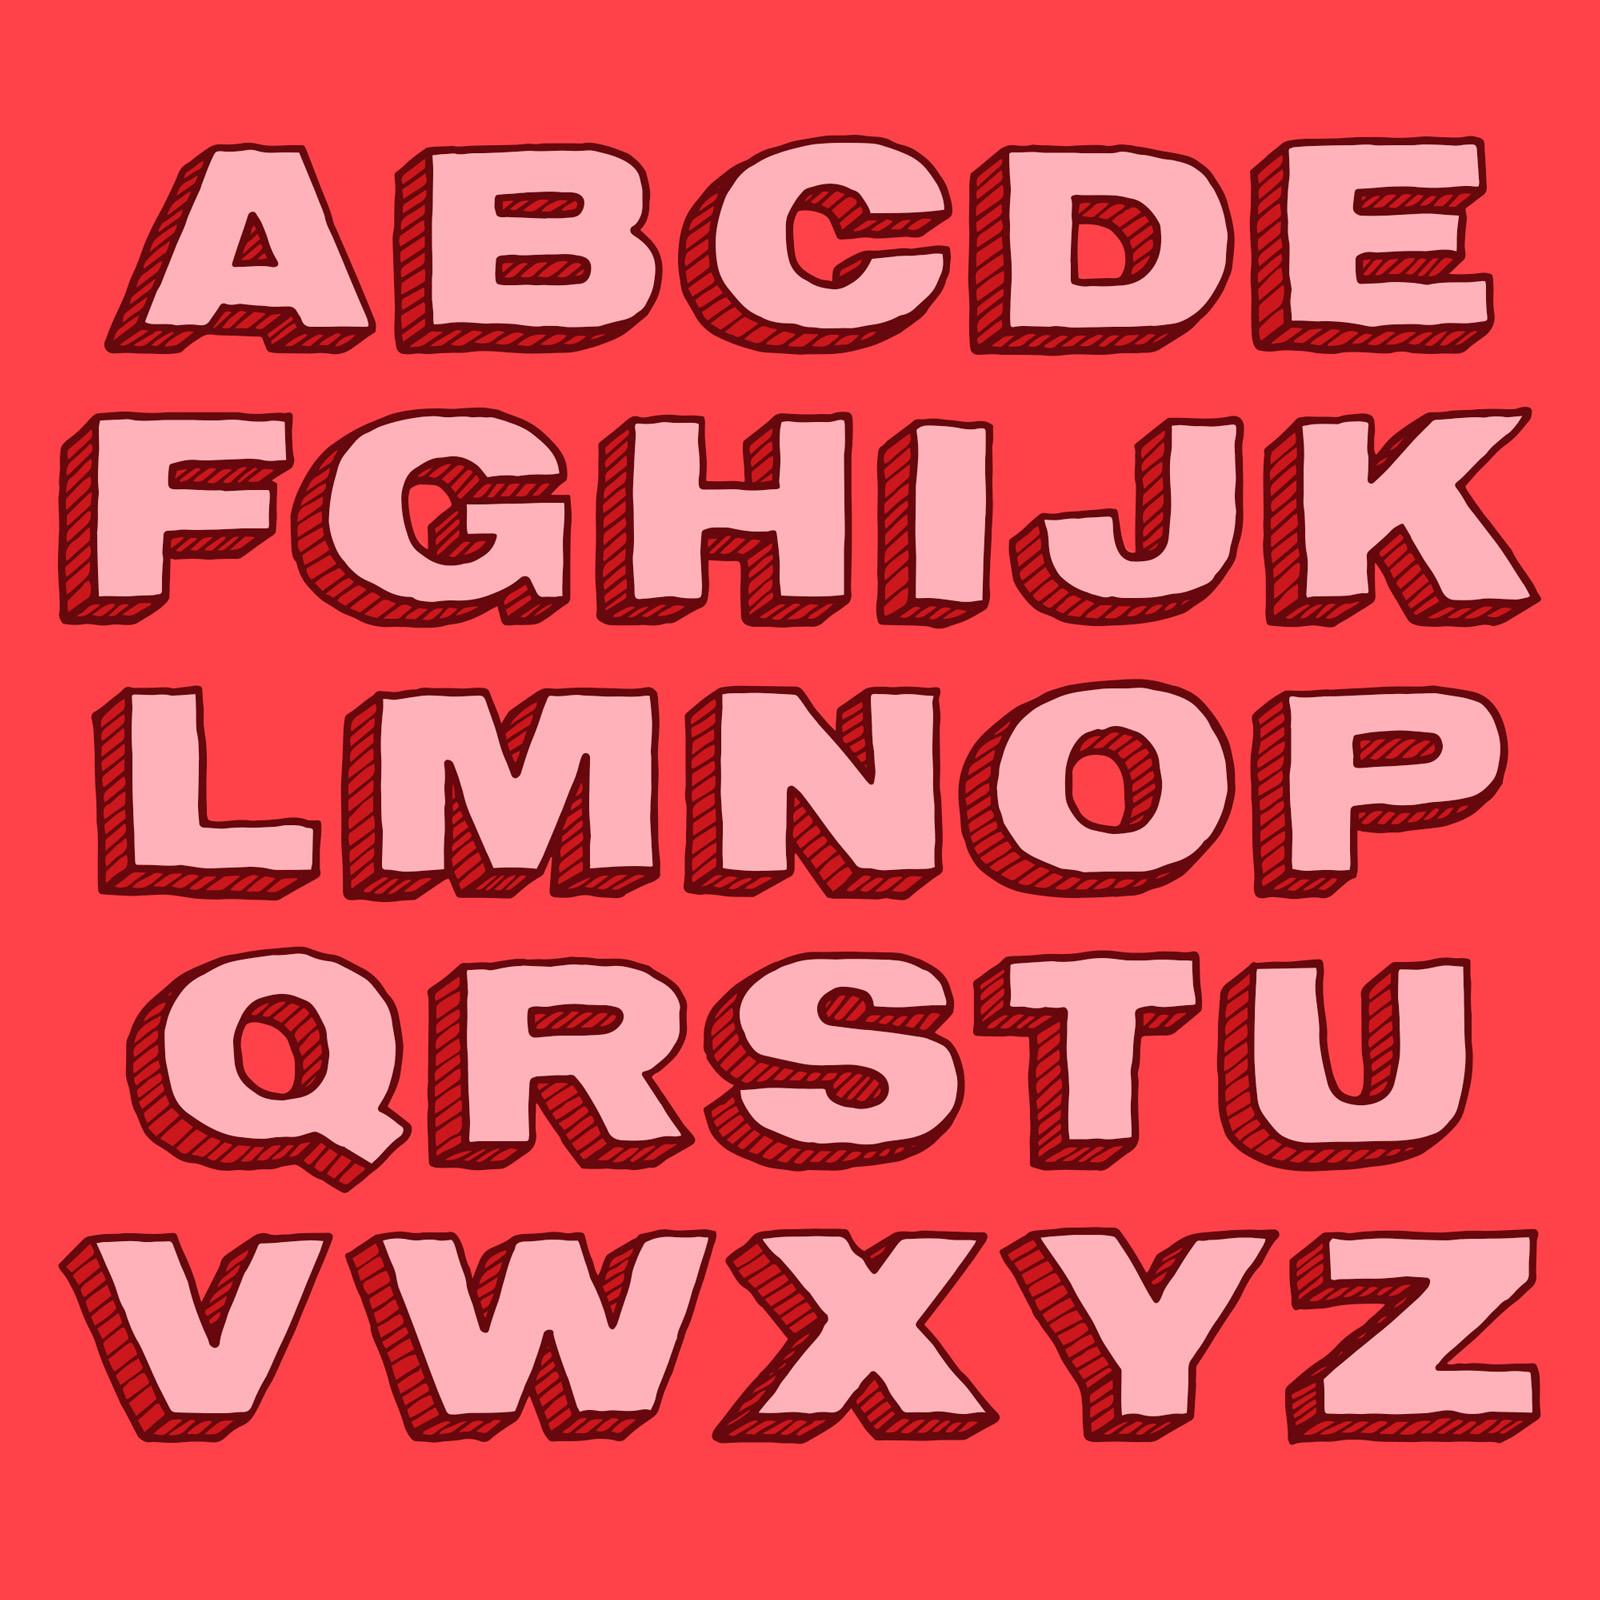 odd-bob-hand-drawn-font-typeface-alphabe